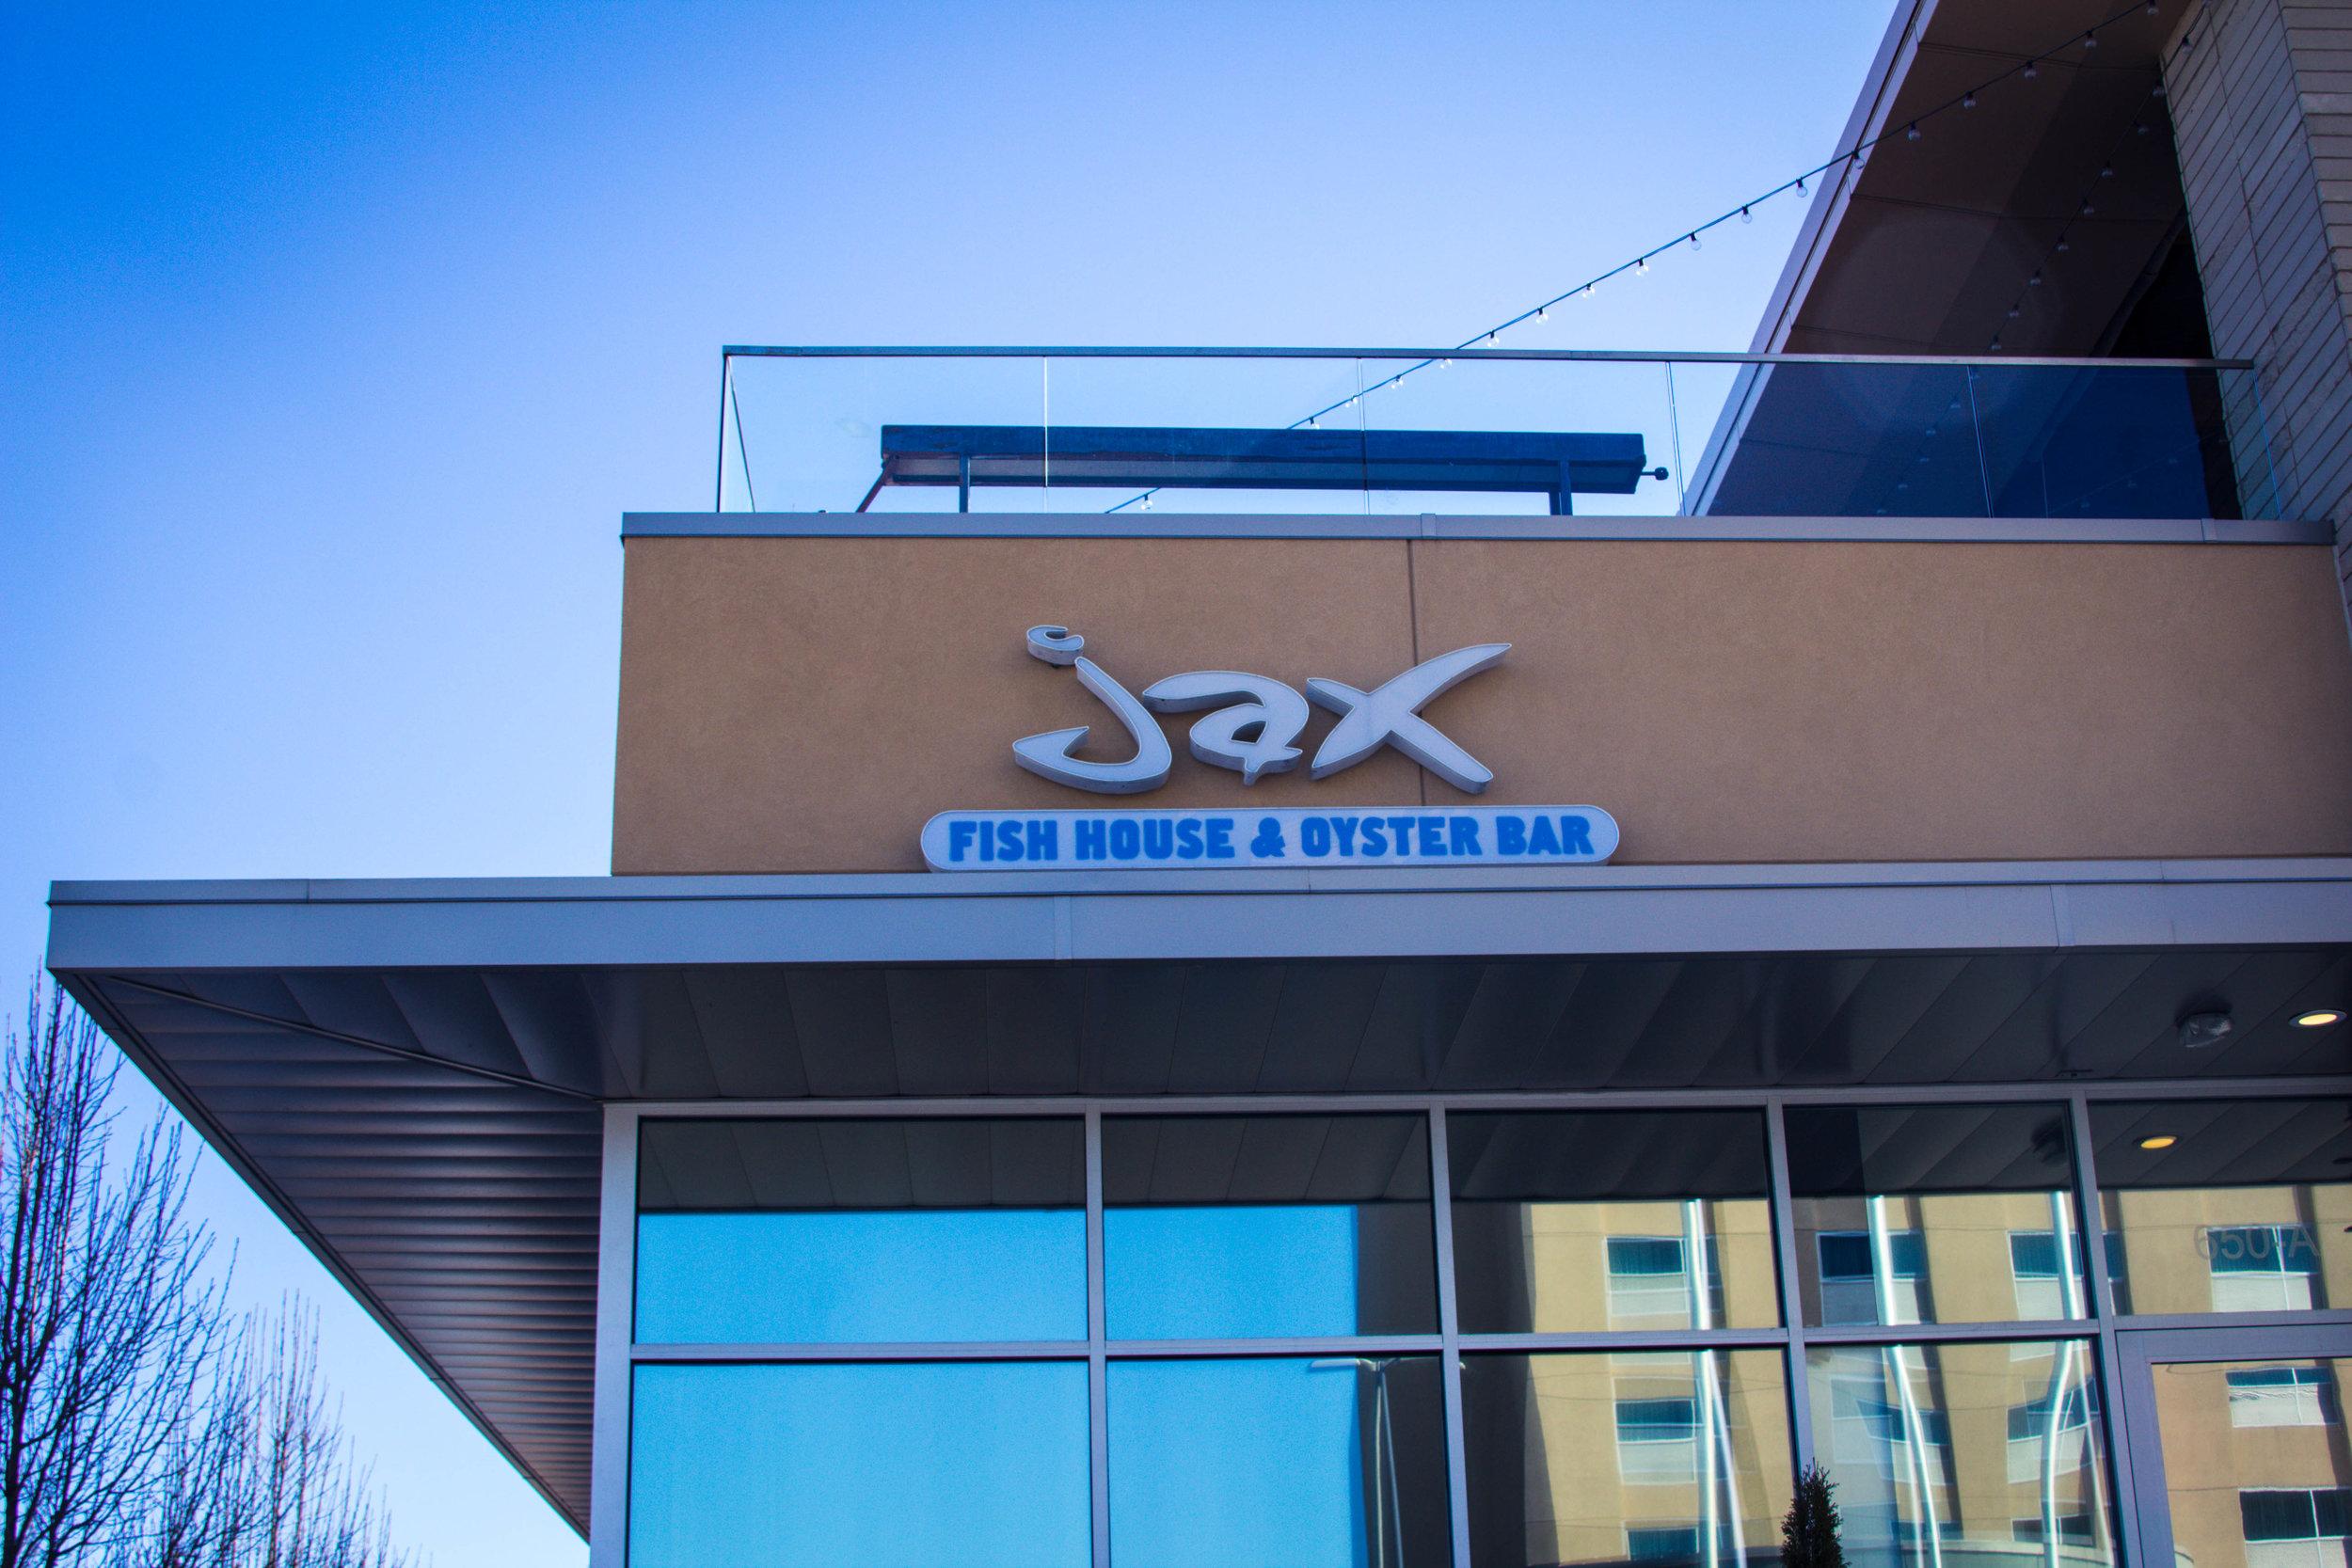 Jax Fish House & Oyster Bar.